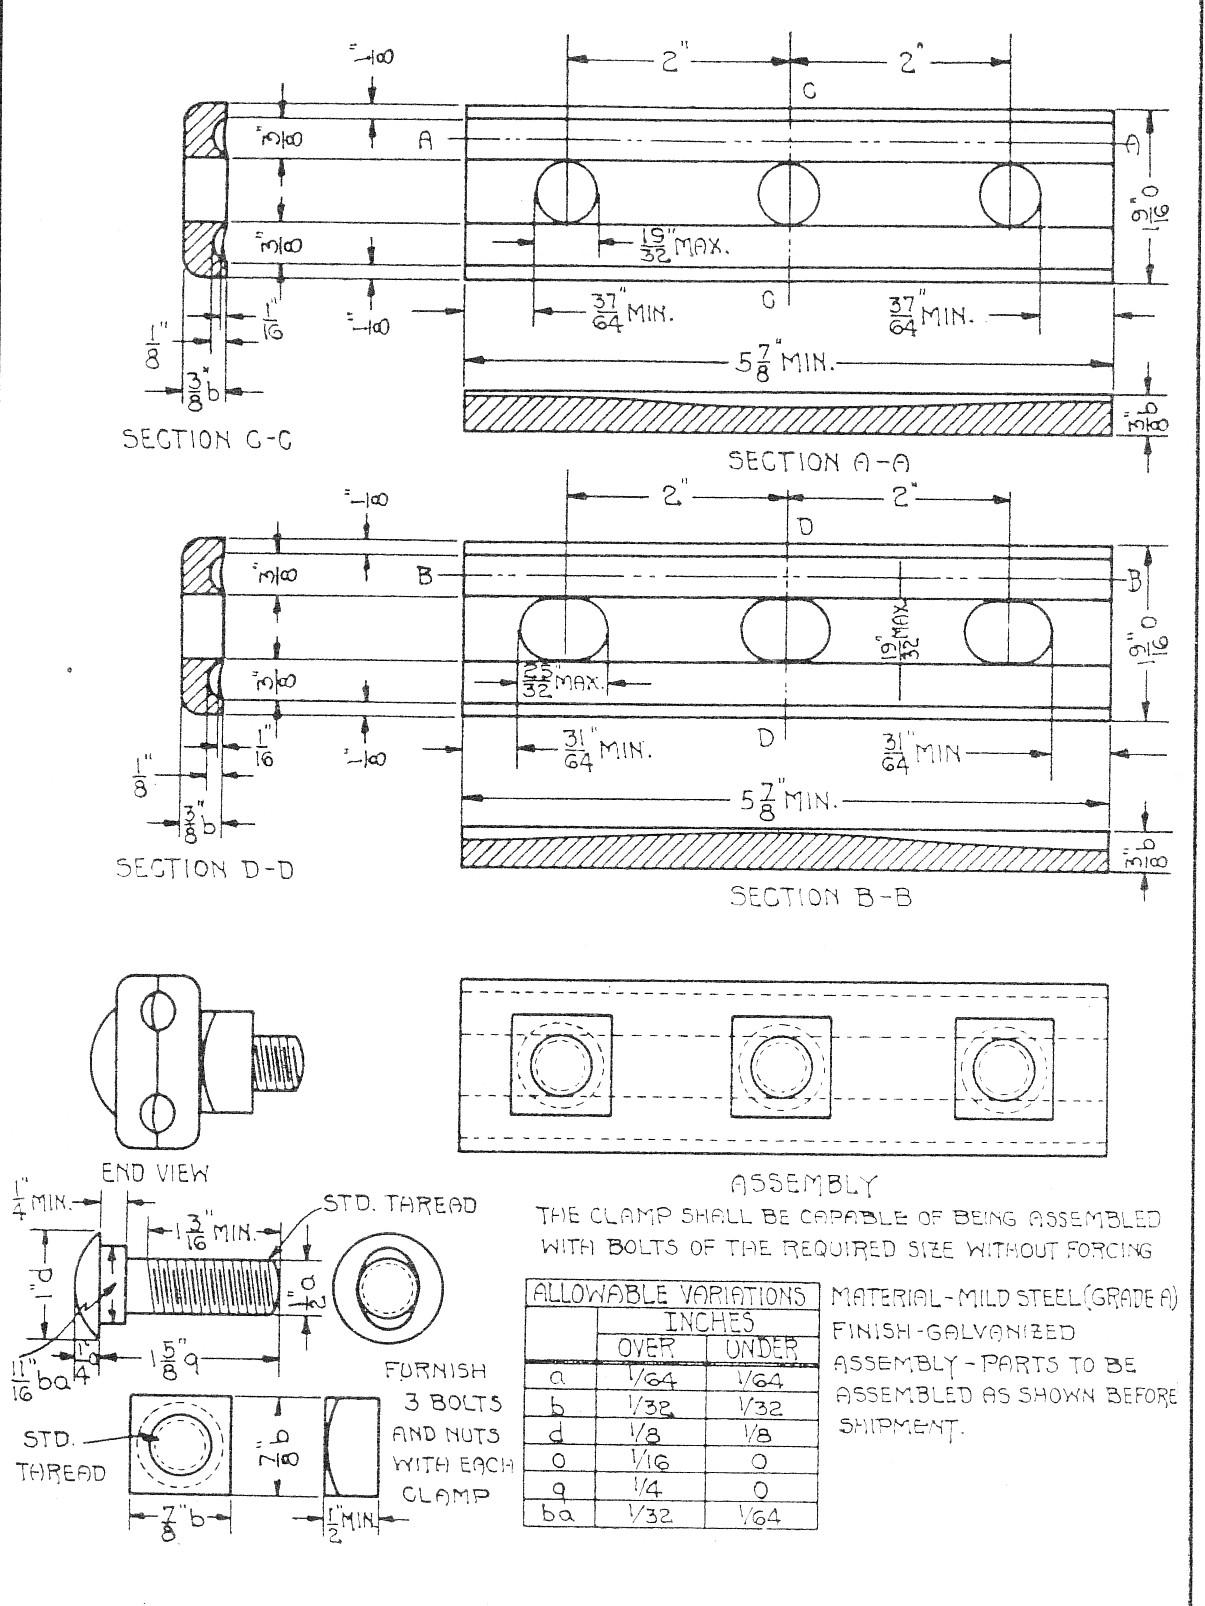 192 signal stat wiring diagram signal stat headlights aftermarket turn signal wiring diagram [ 1205 x 1606 Pixel ]